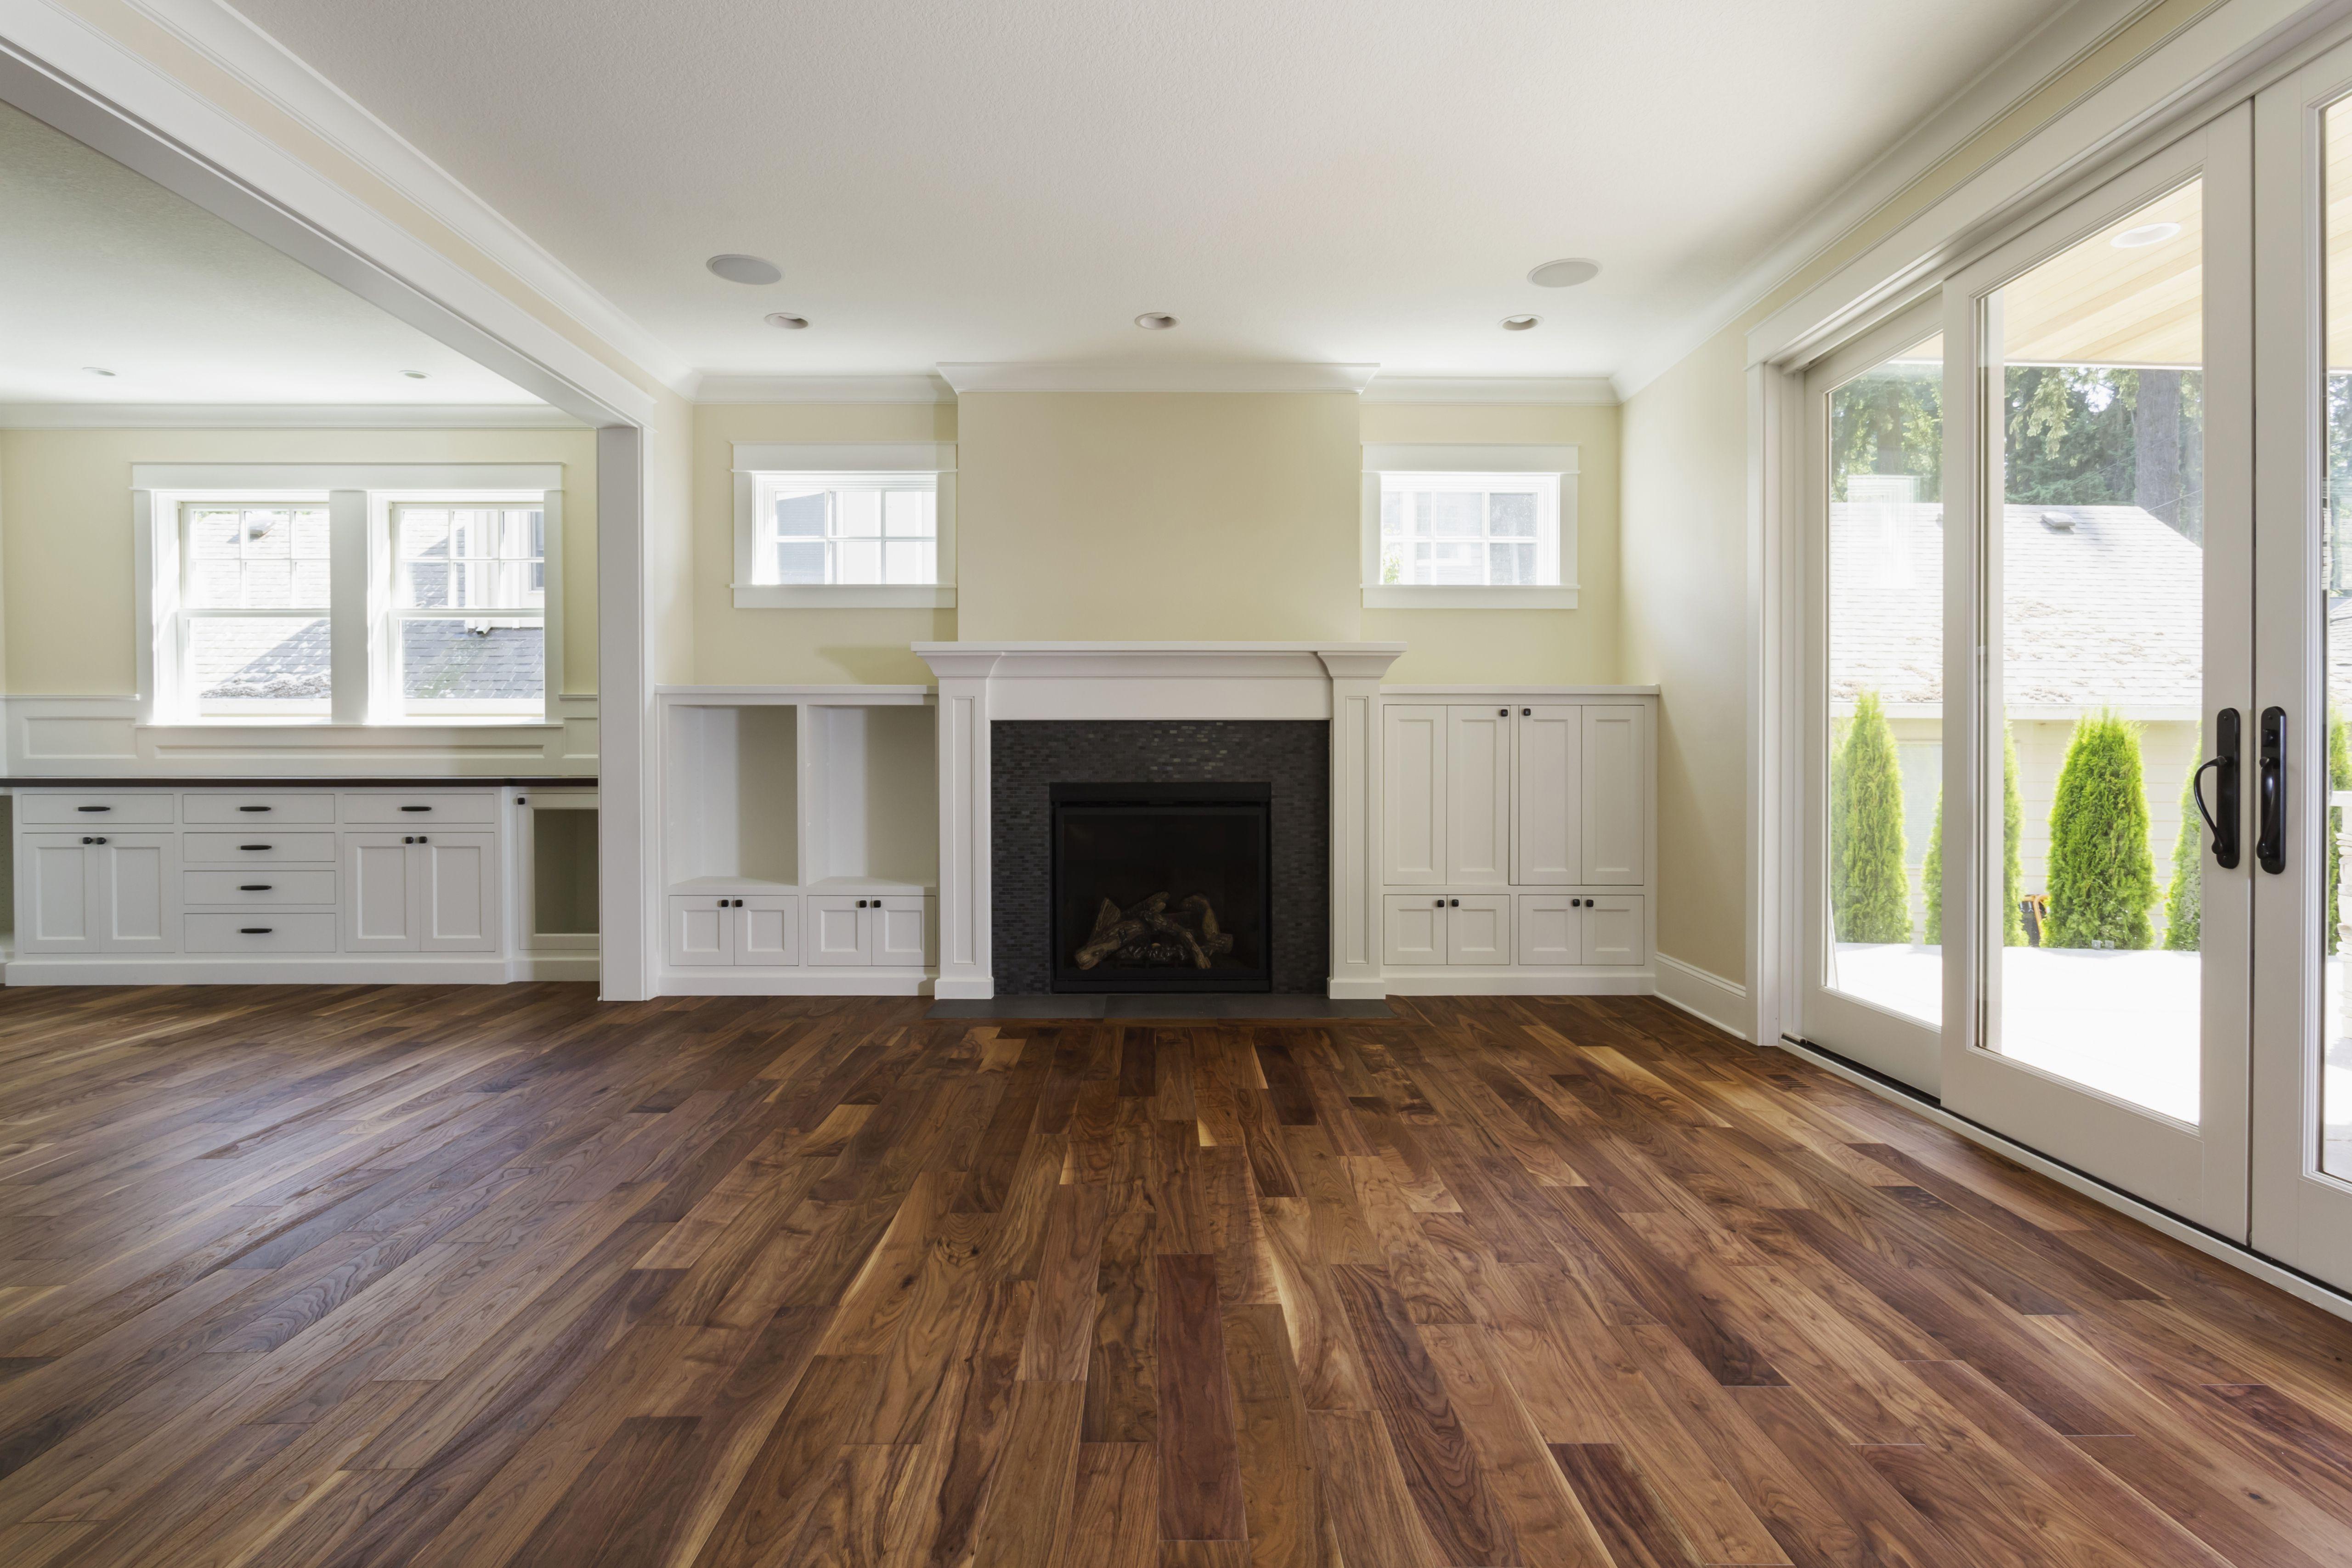 18 Stylish Best Hardwood Floor Stain Colors Unique Flooring Ideas